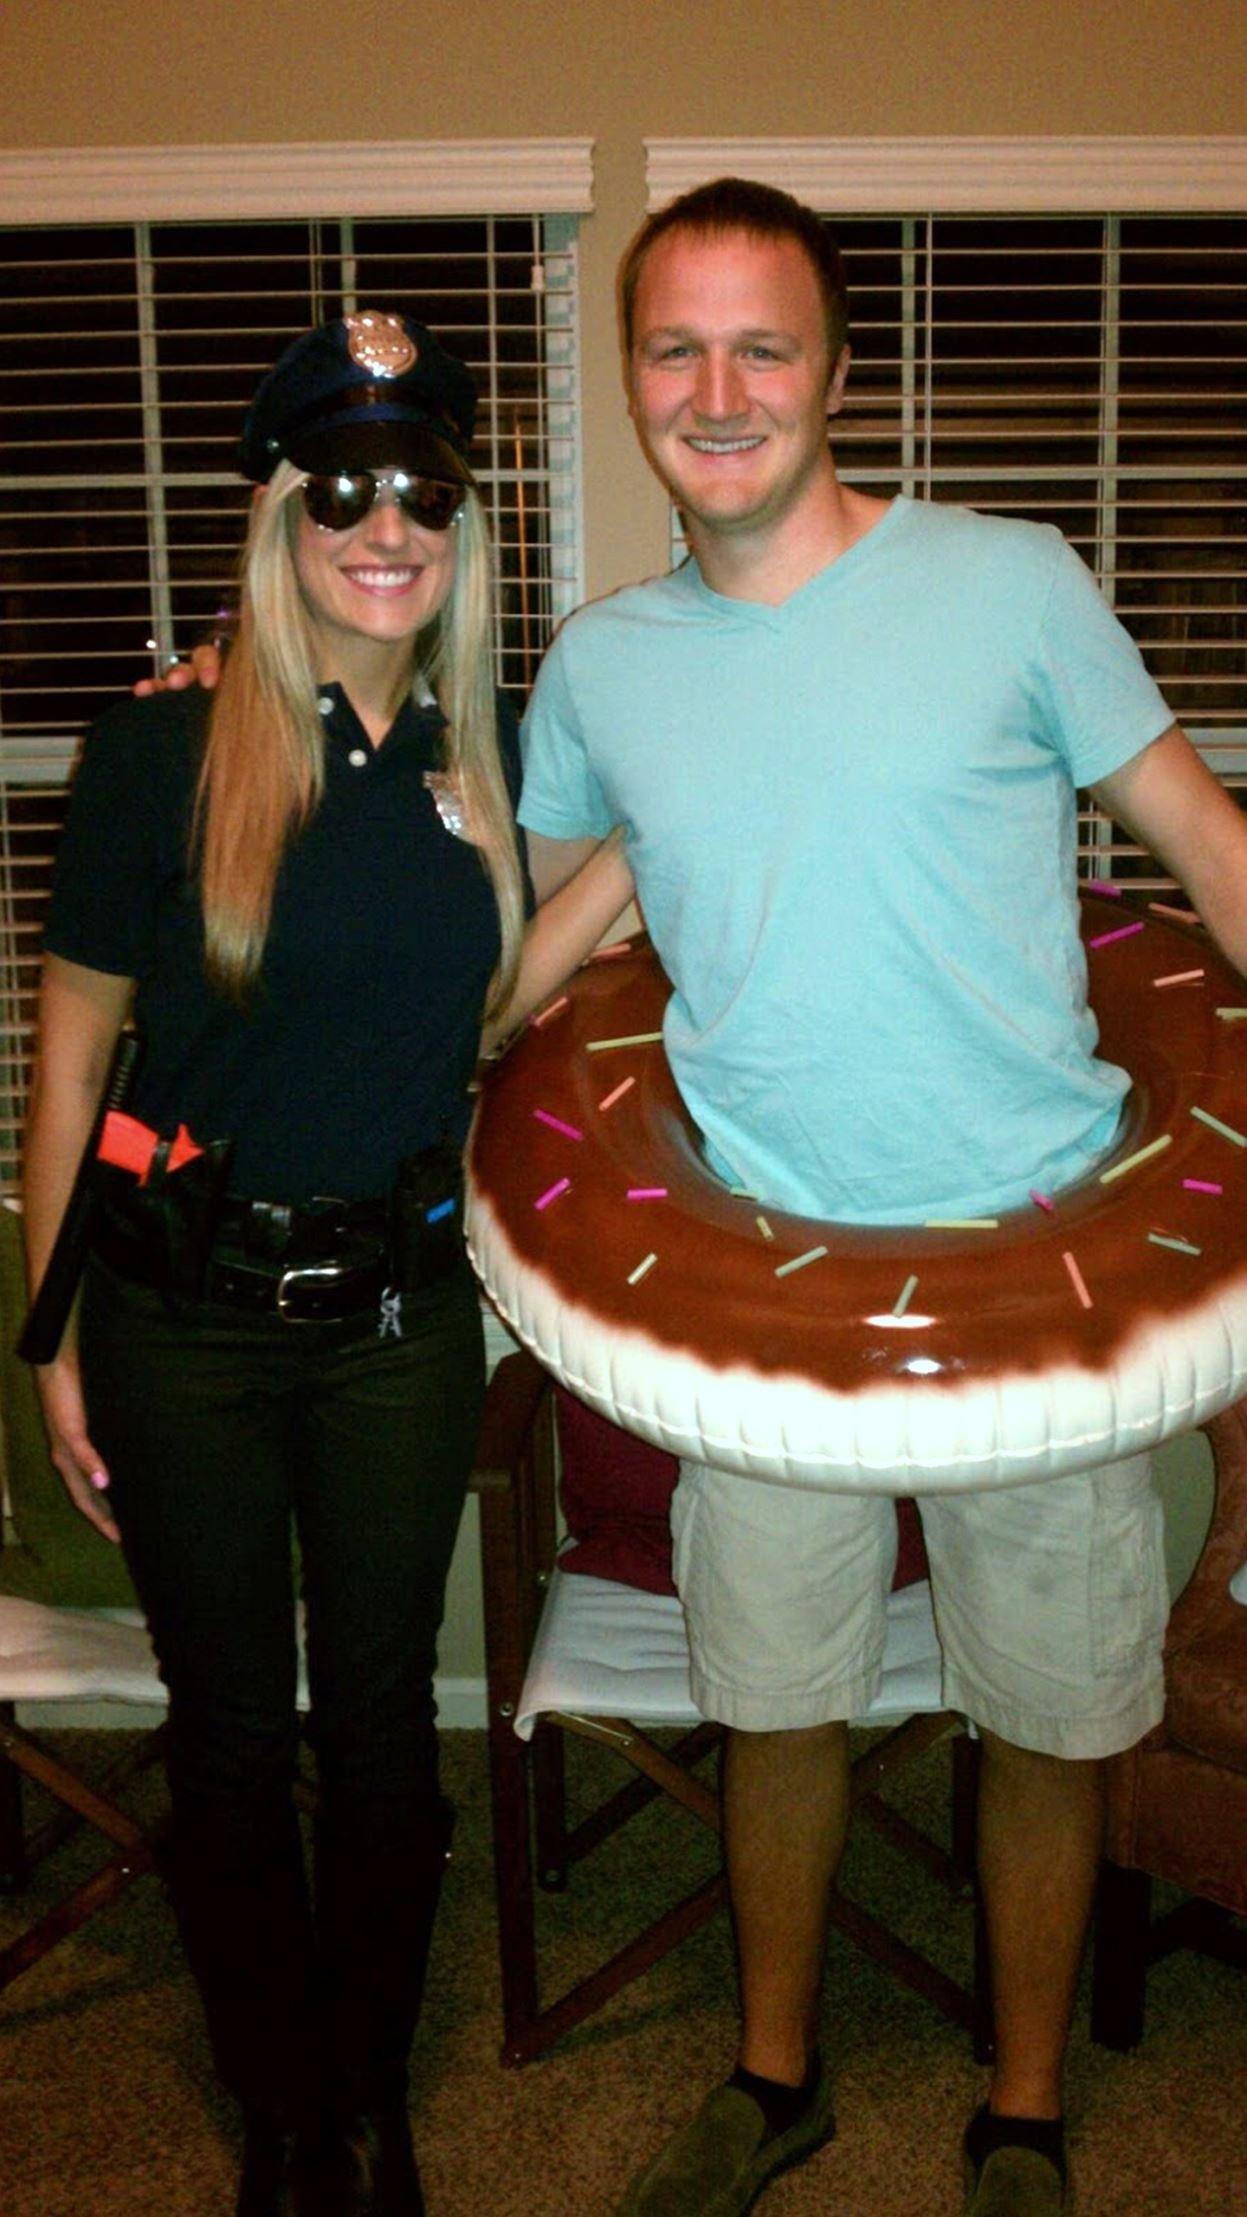 10 Perfect Couples Funny Halloween Costume Ideas 15 funny halloween costumes for couples costume ideas pinterest 1 2021